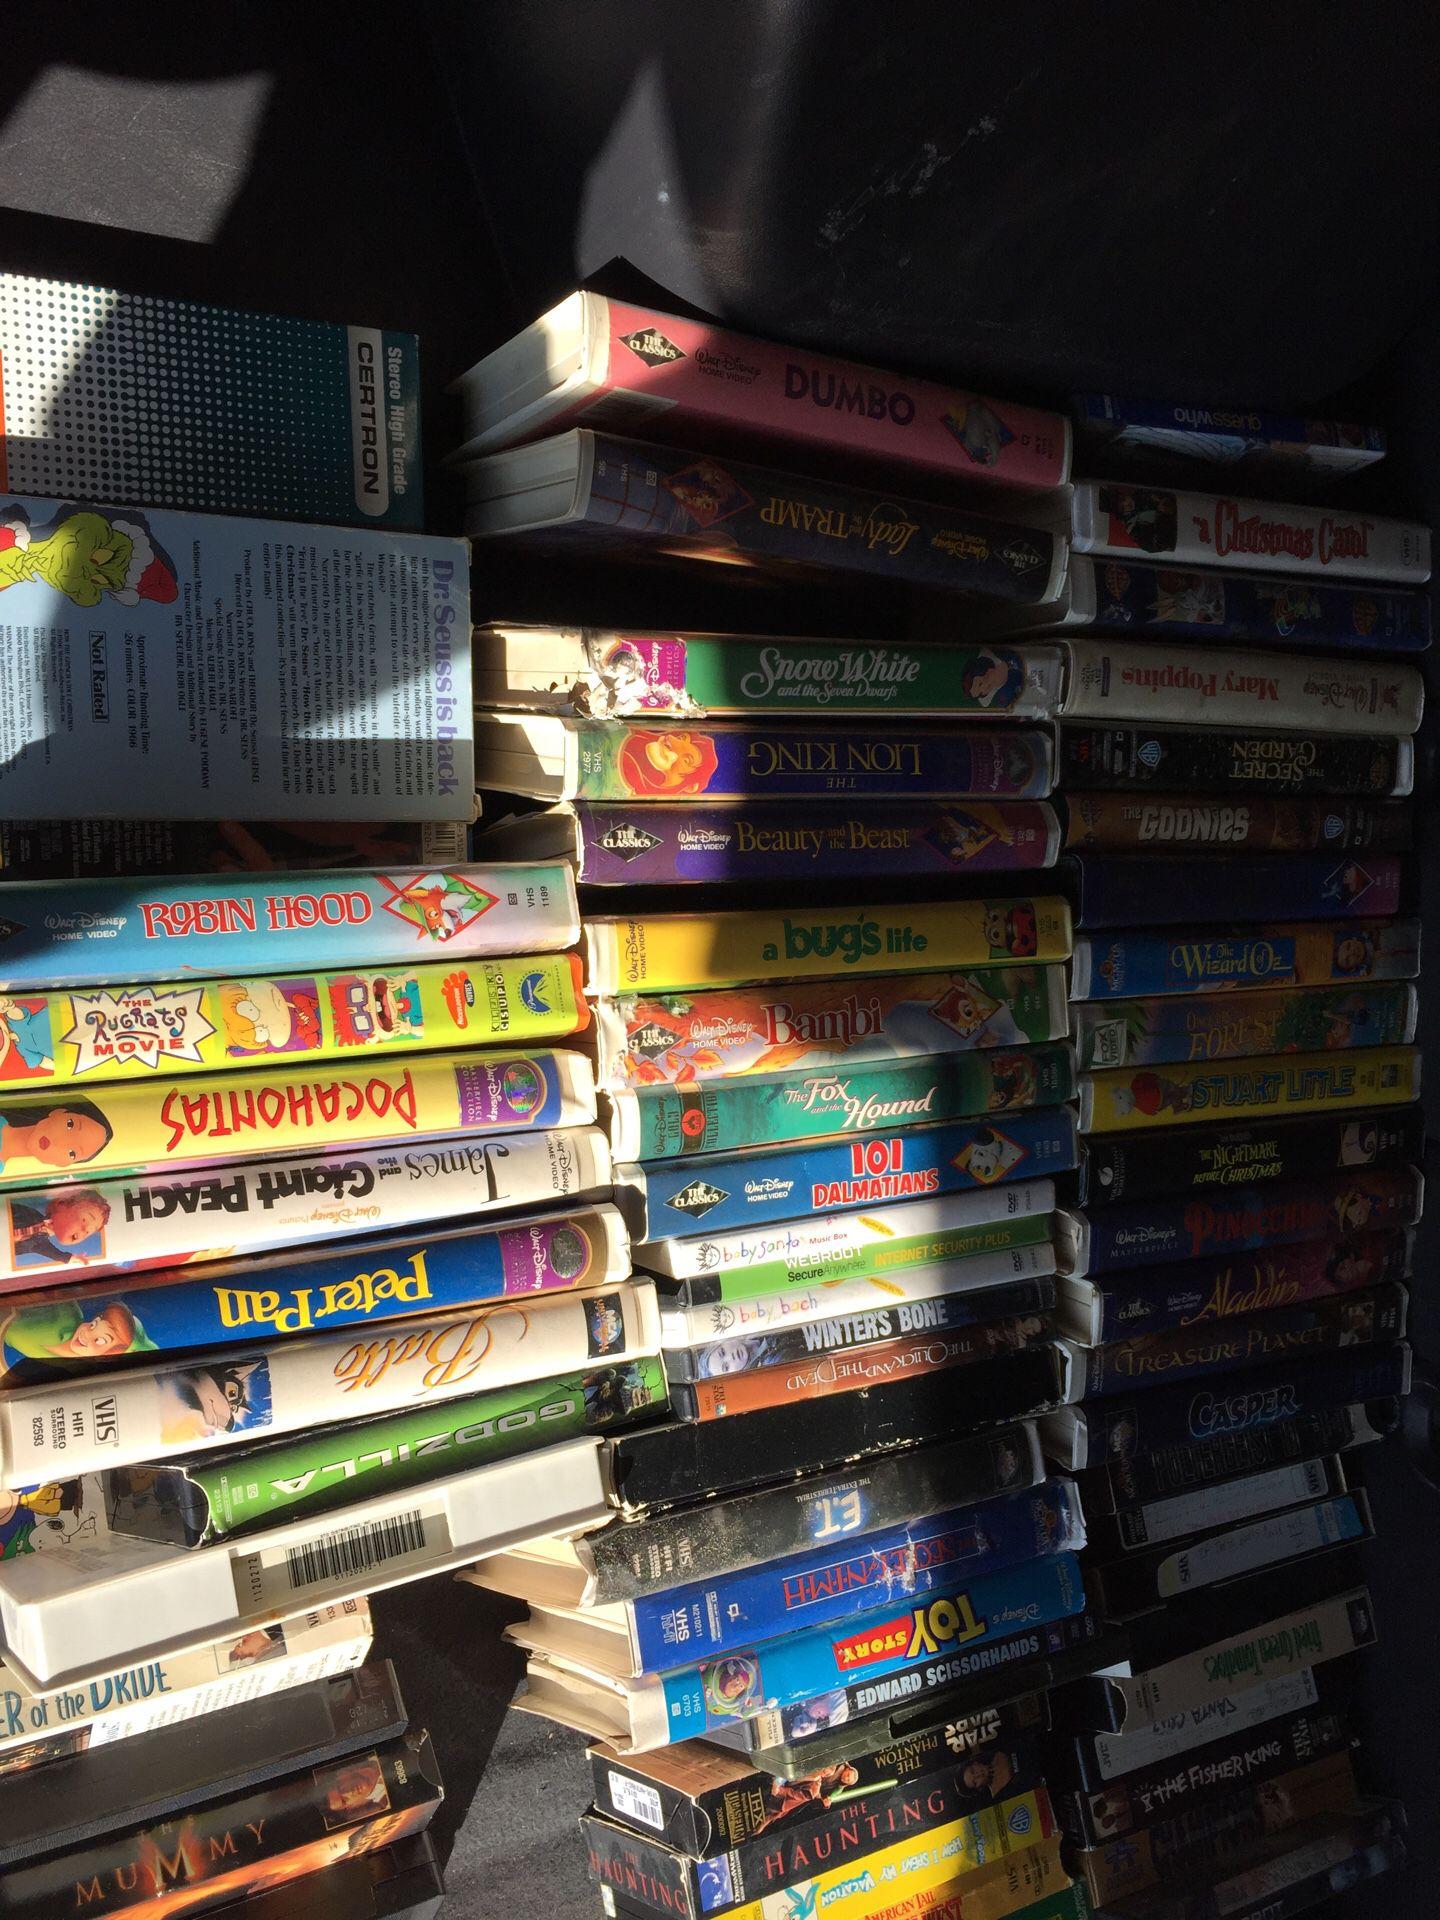 Disney vhs tapes